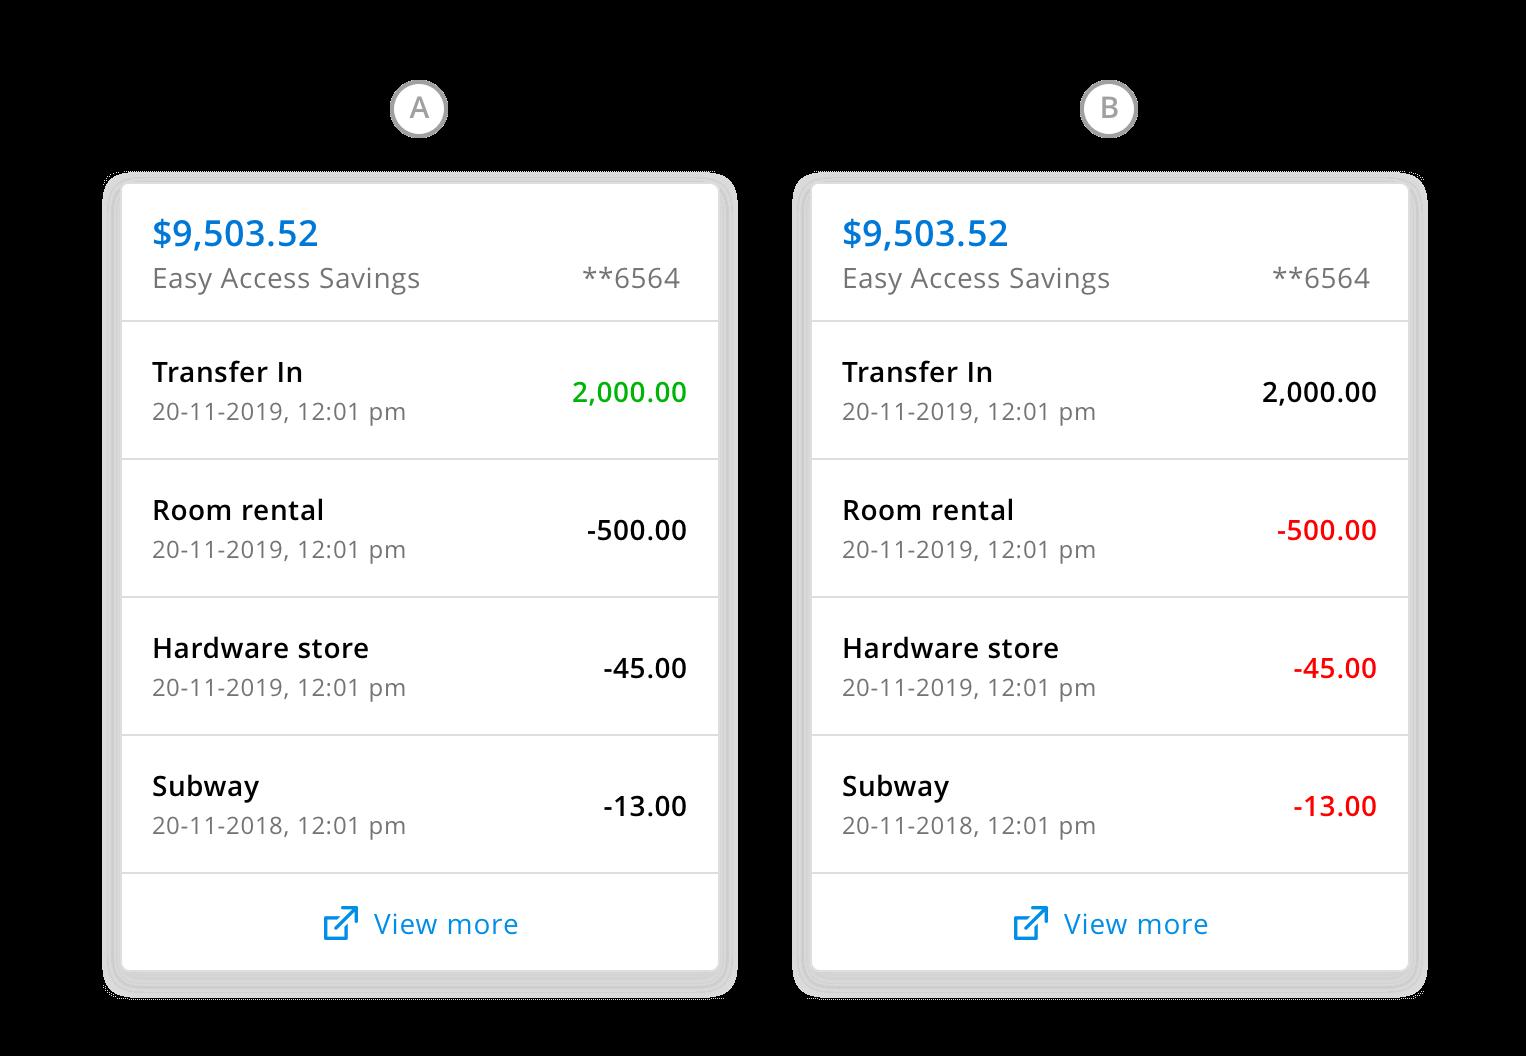 Account balance comparison